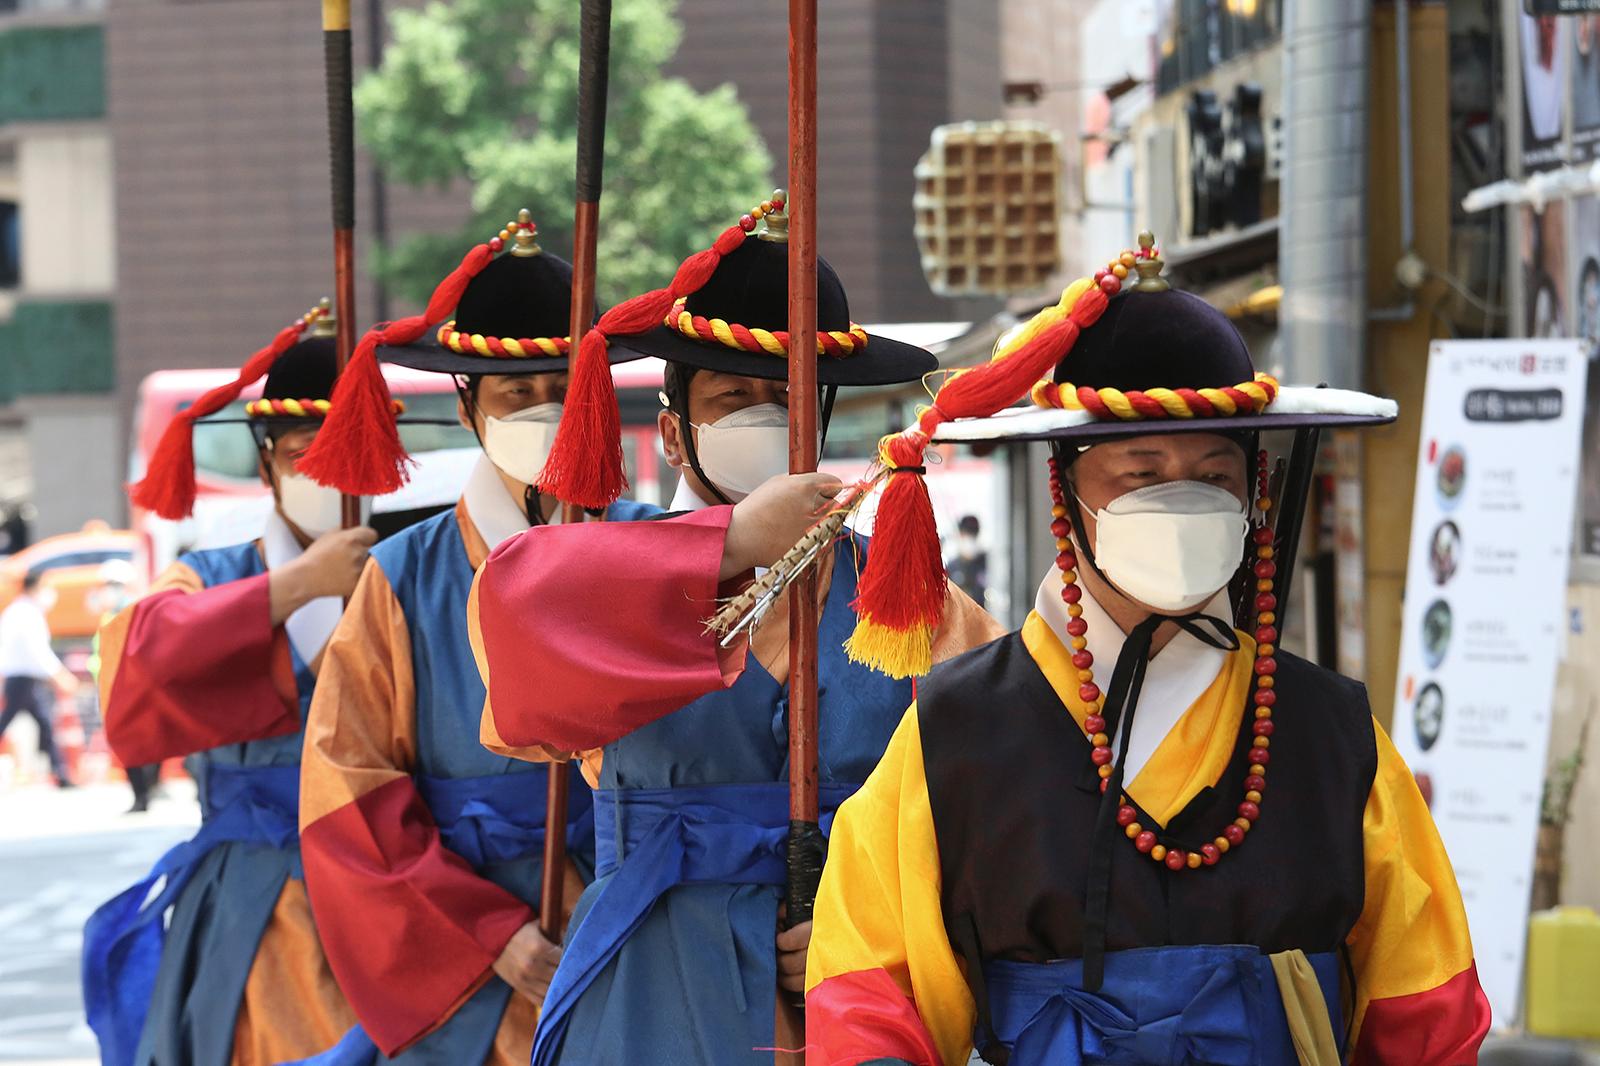 South Korean Imperial guards wear face masks near the Deoksu Palace in Seoul, South Korea, on July 3.